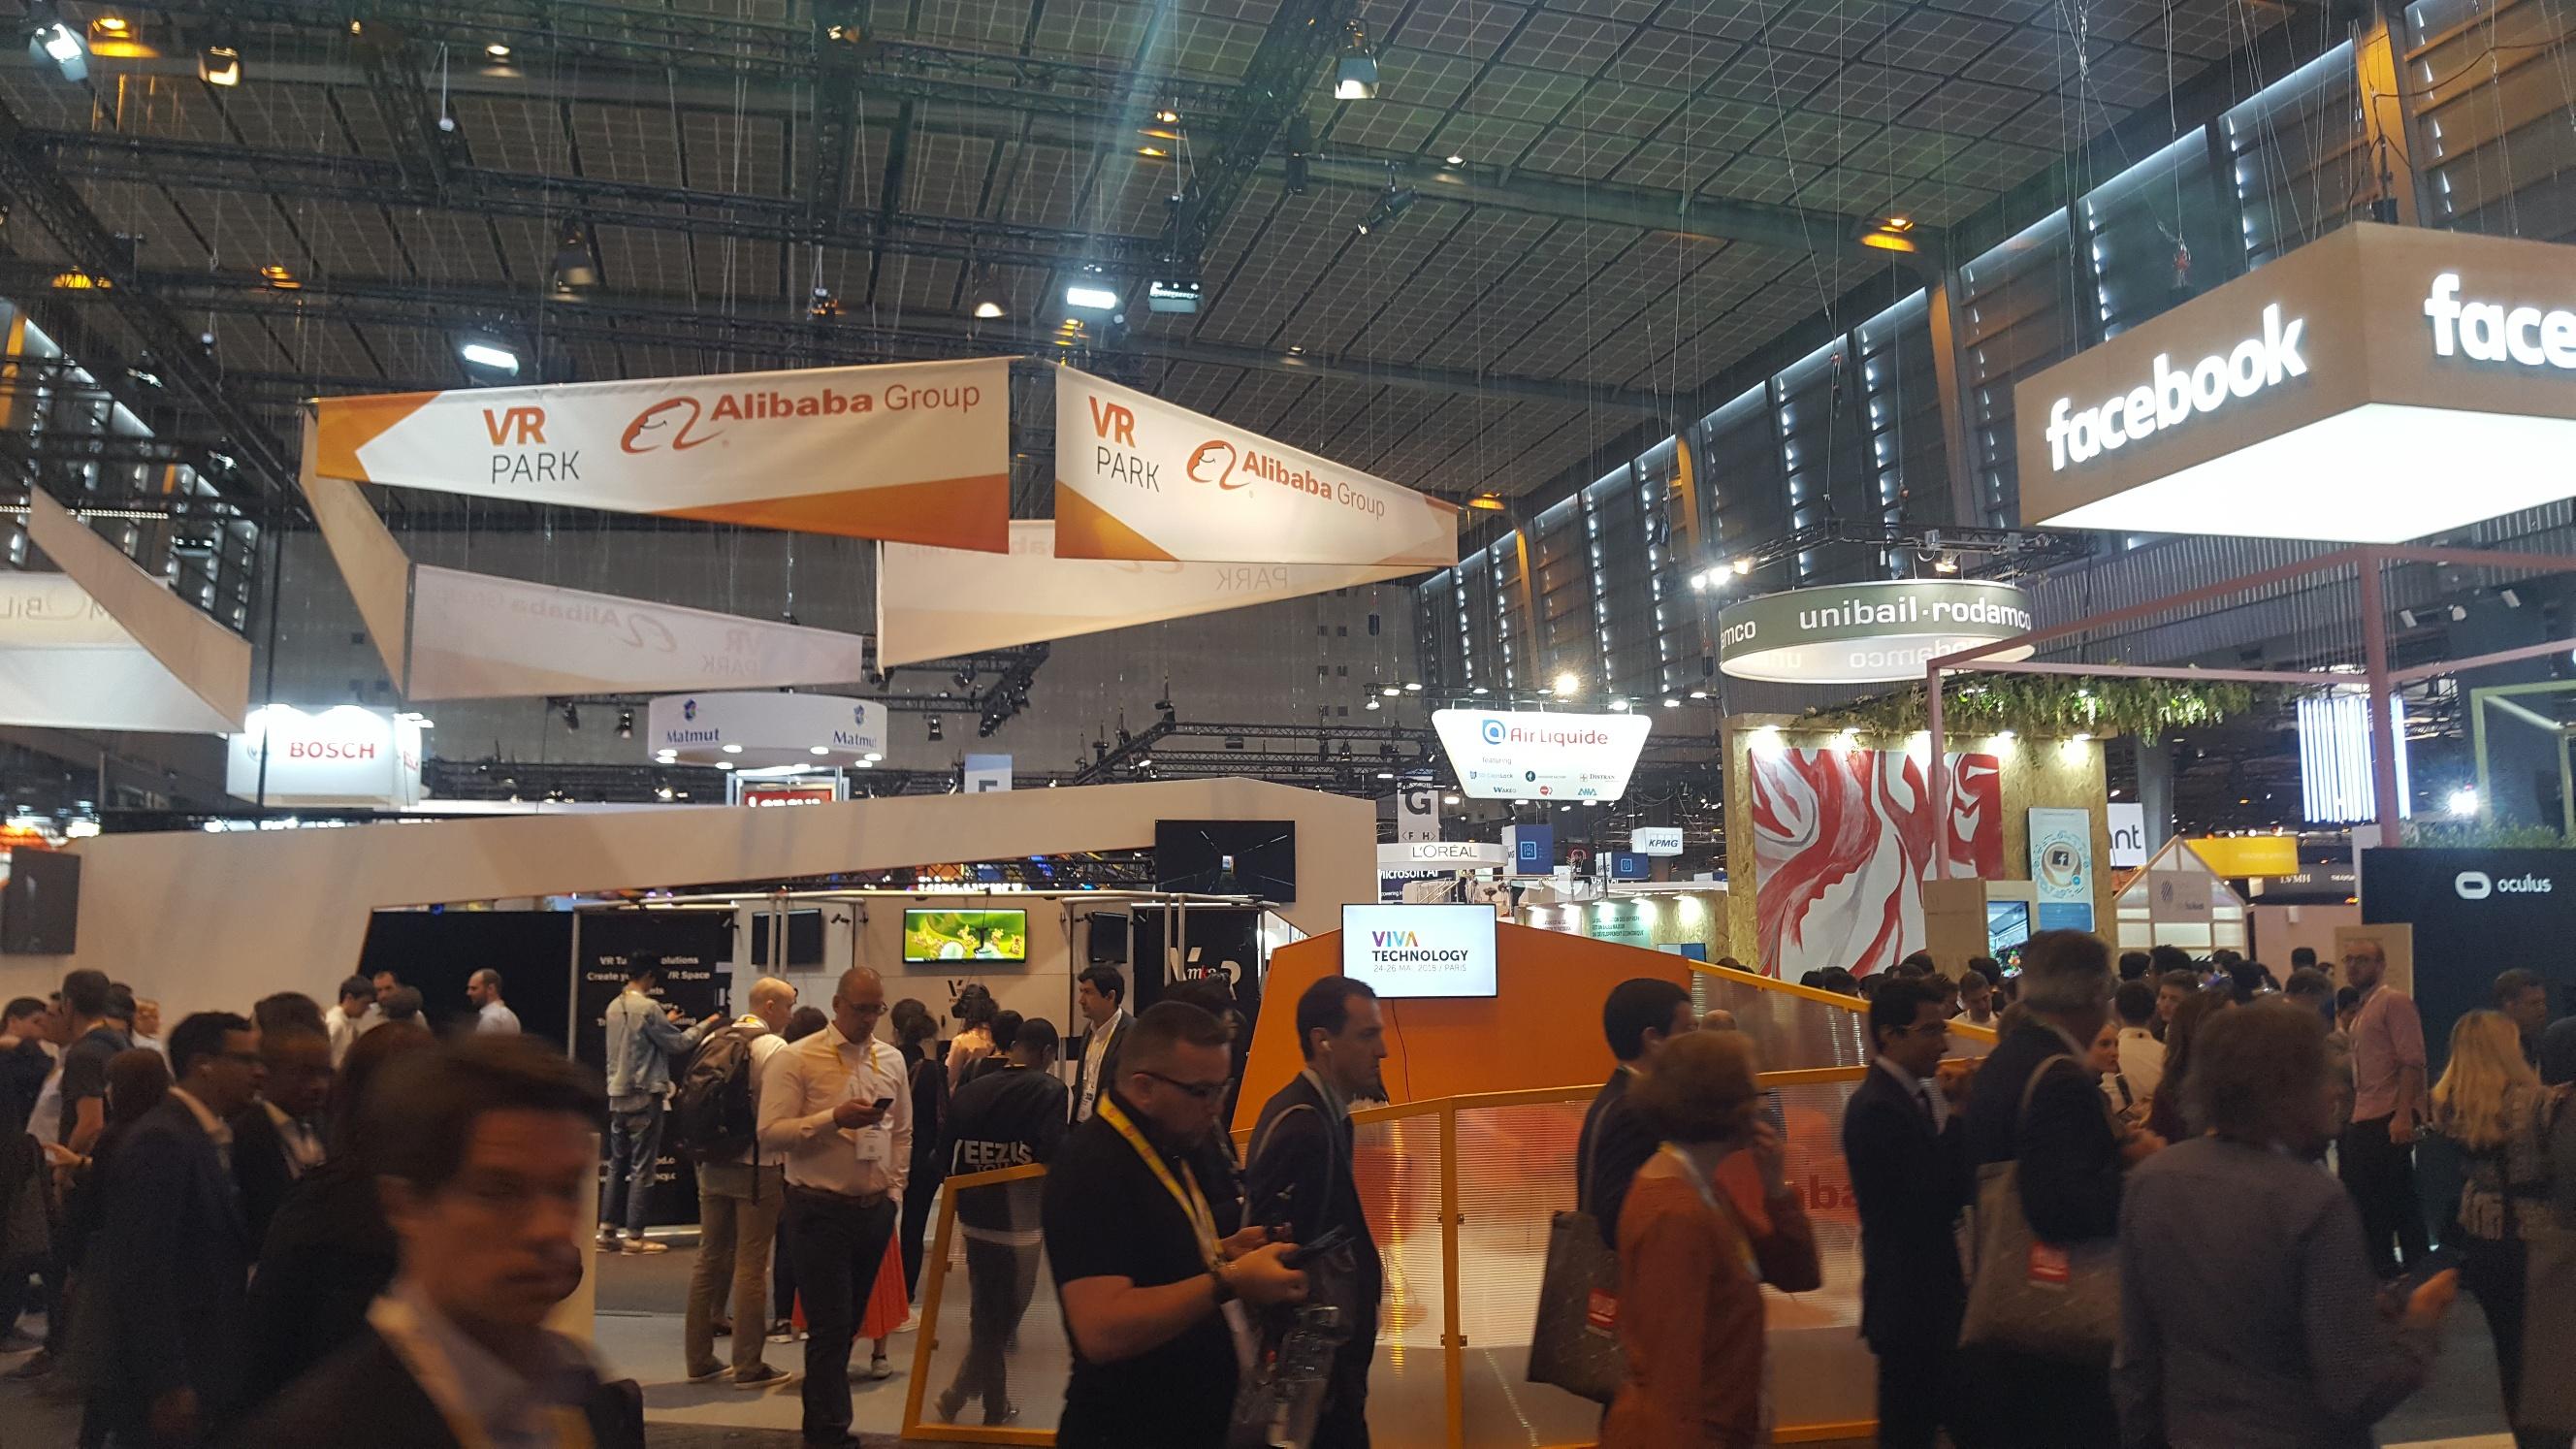 GS1 France at Viva Technology 2018